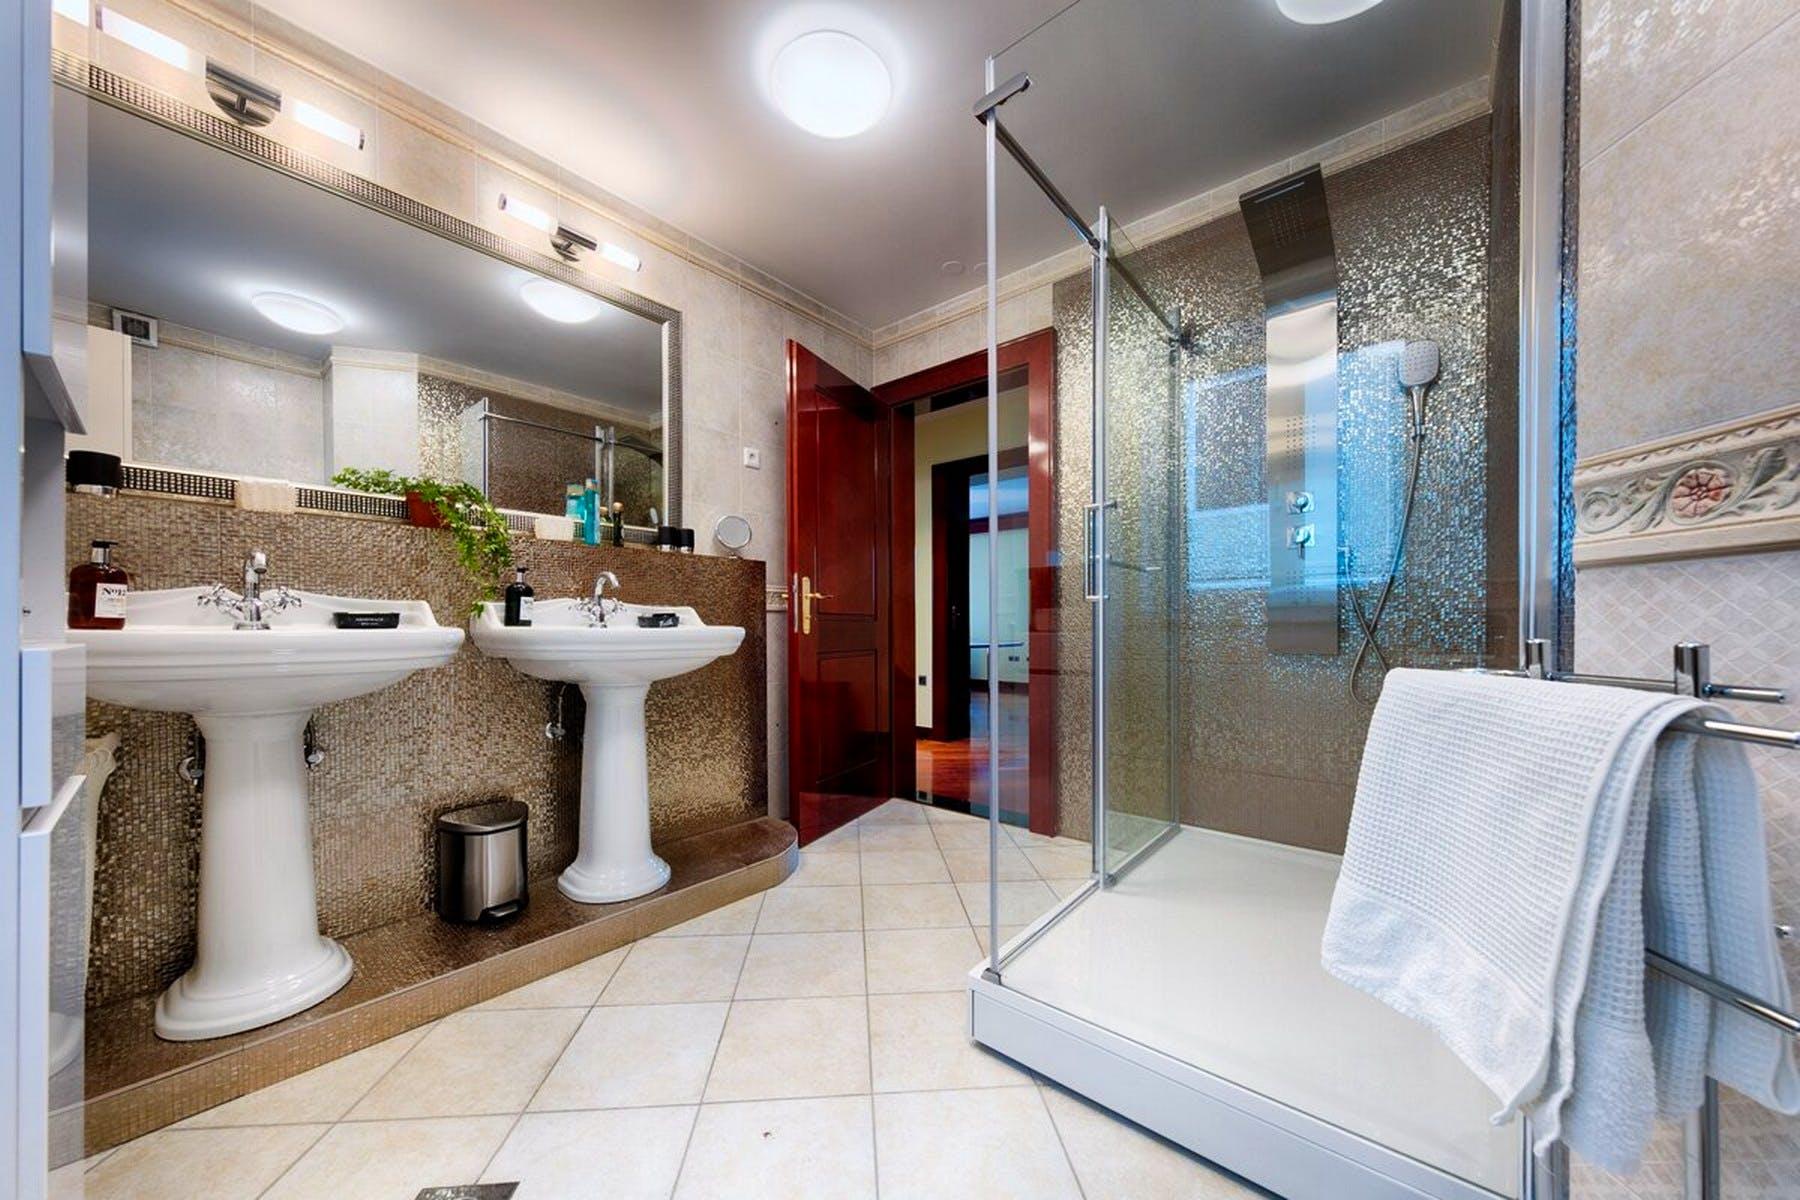 Veoma prostrana kupaonica